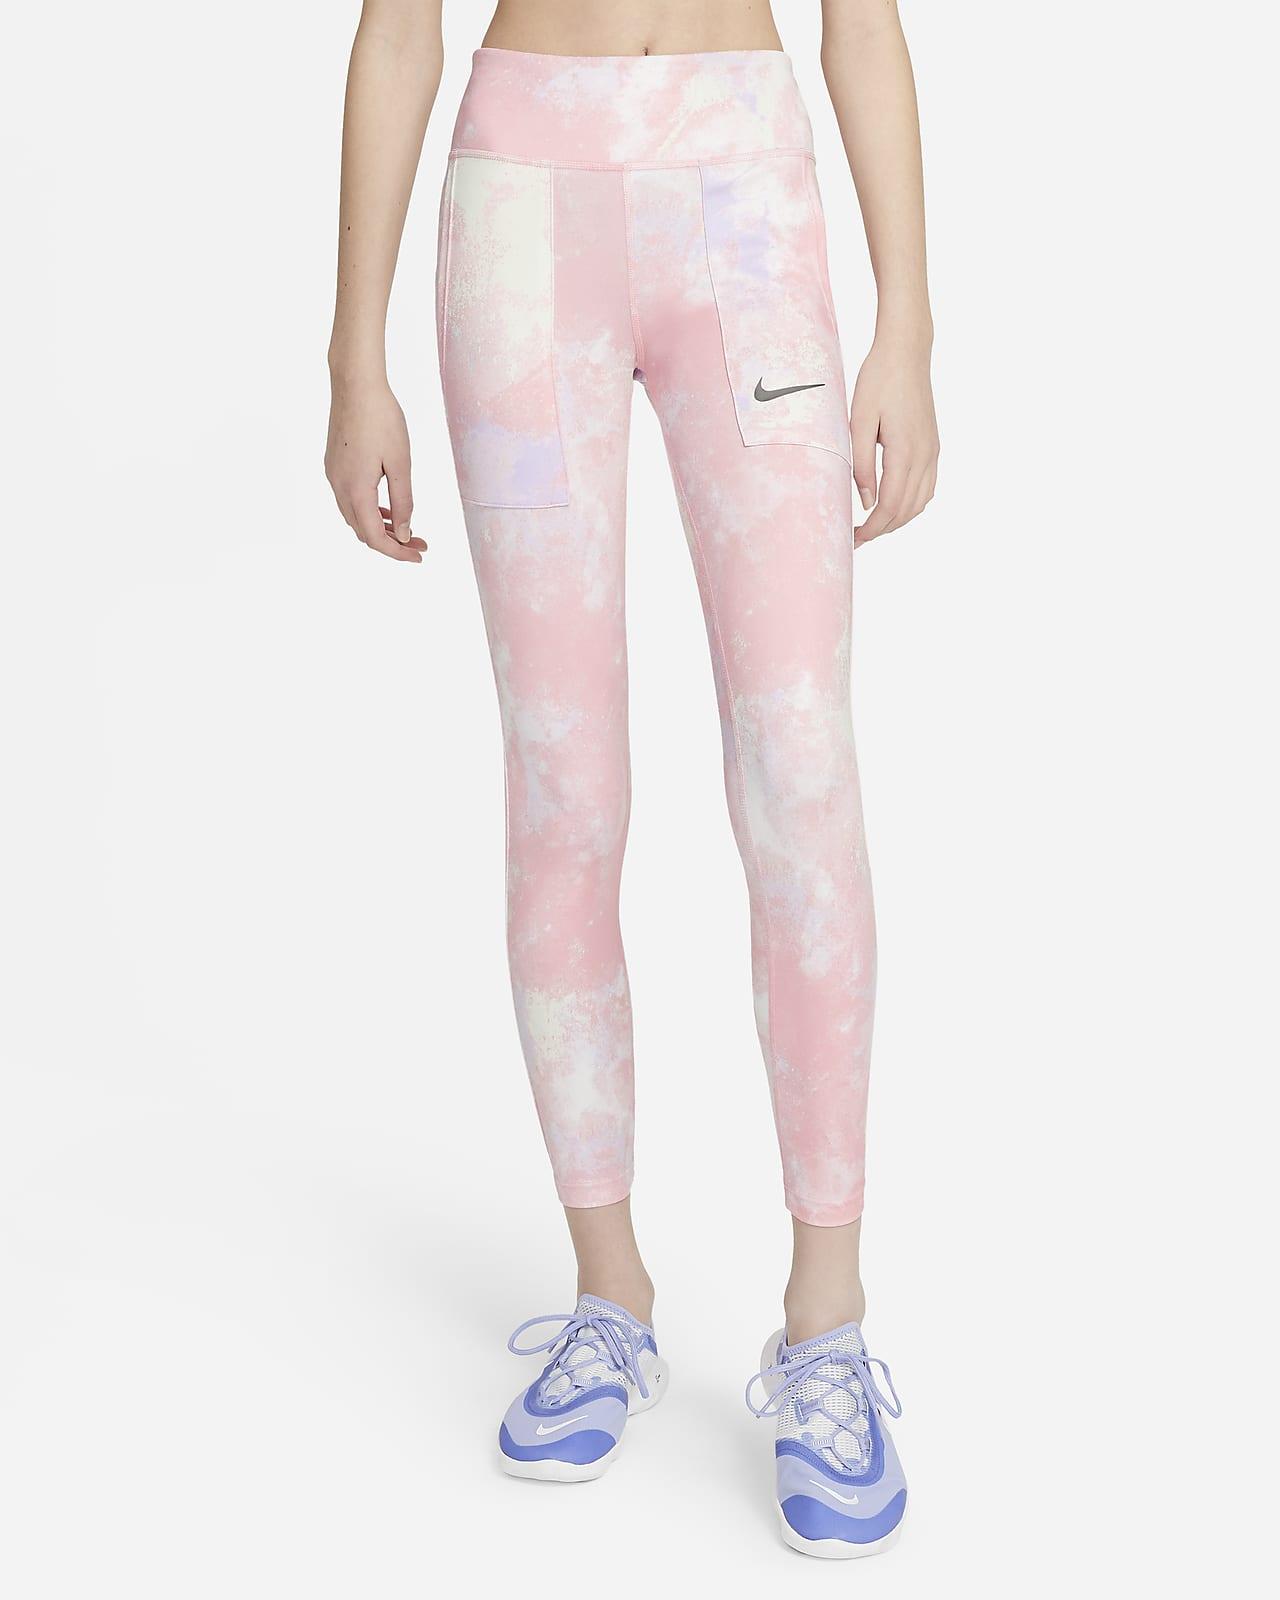 Nike One 大童(女孩)扎染印花紧身裤